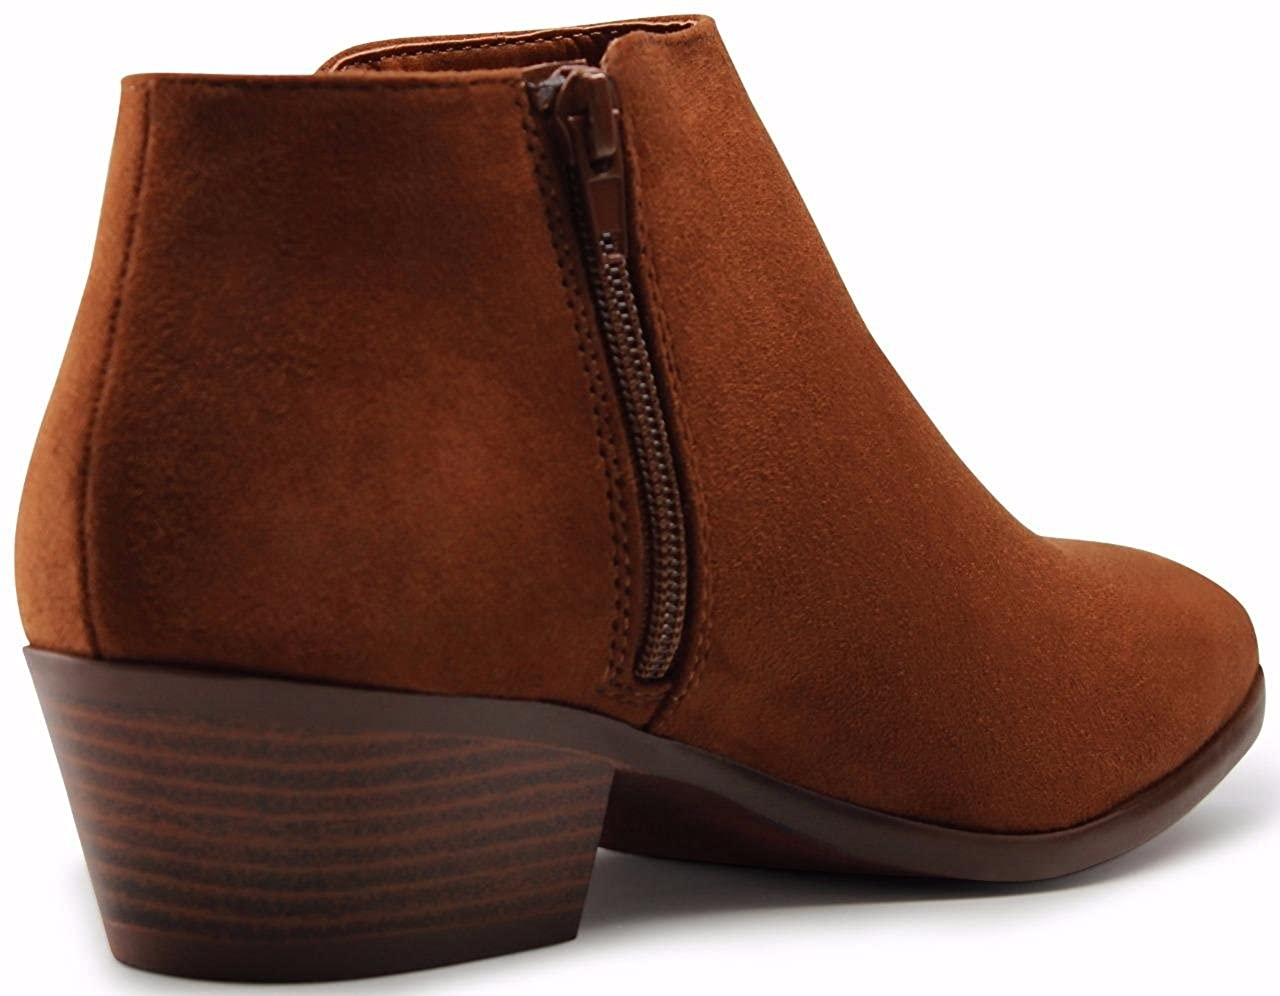 4873e84a3616 Amazon.com   MARCOREPUBLIC Marco Republic Madrid Womens Medium Low Heels  Ankle Booties Boots - (Cognac) - 8   Boots